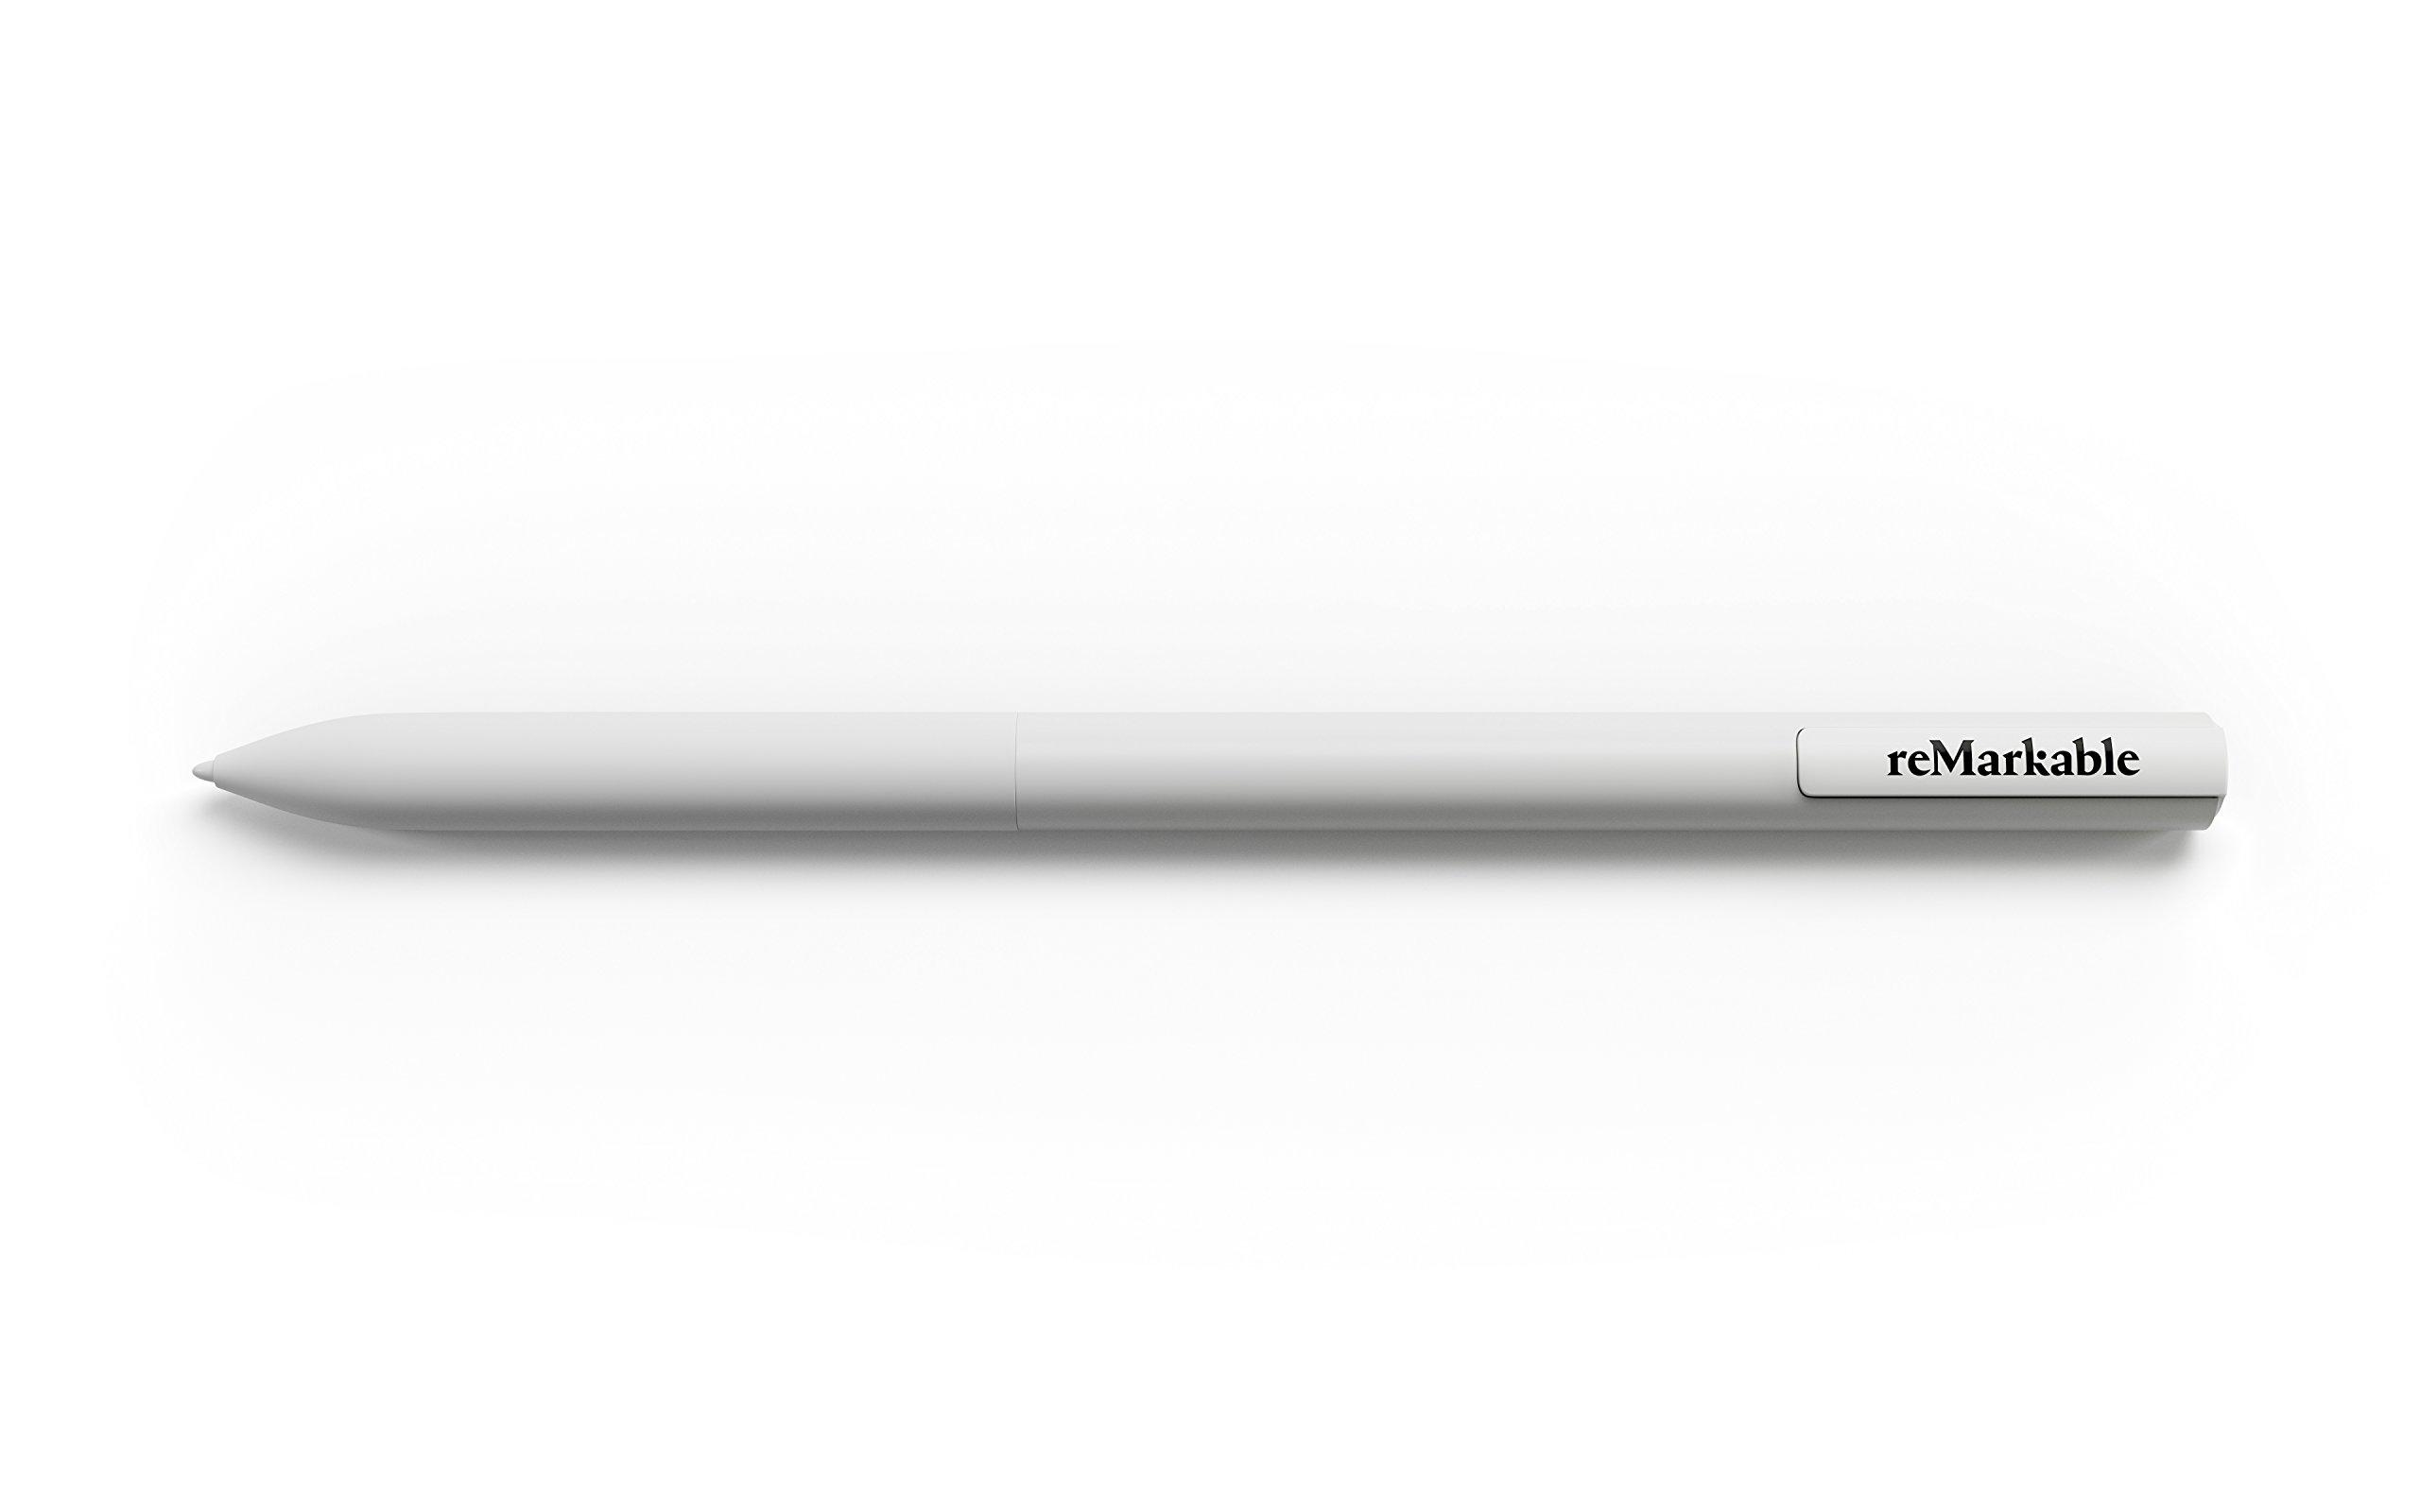 reMarkable Marker - Original Stylus for The Paper Tablet